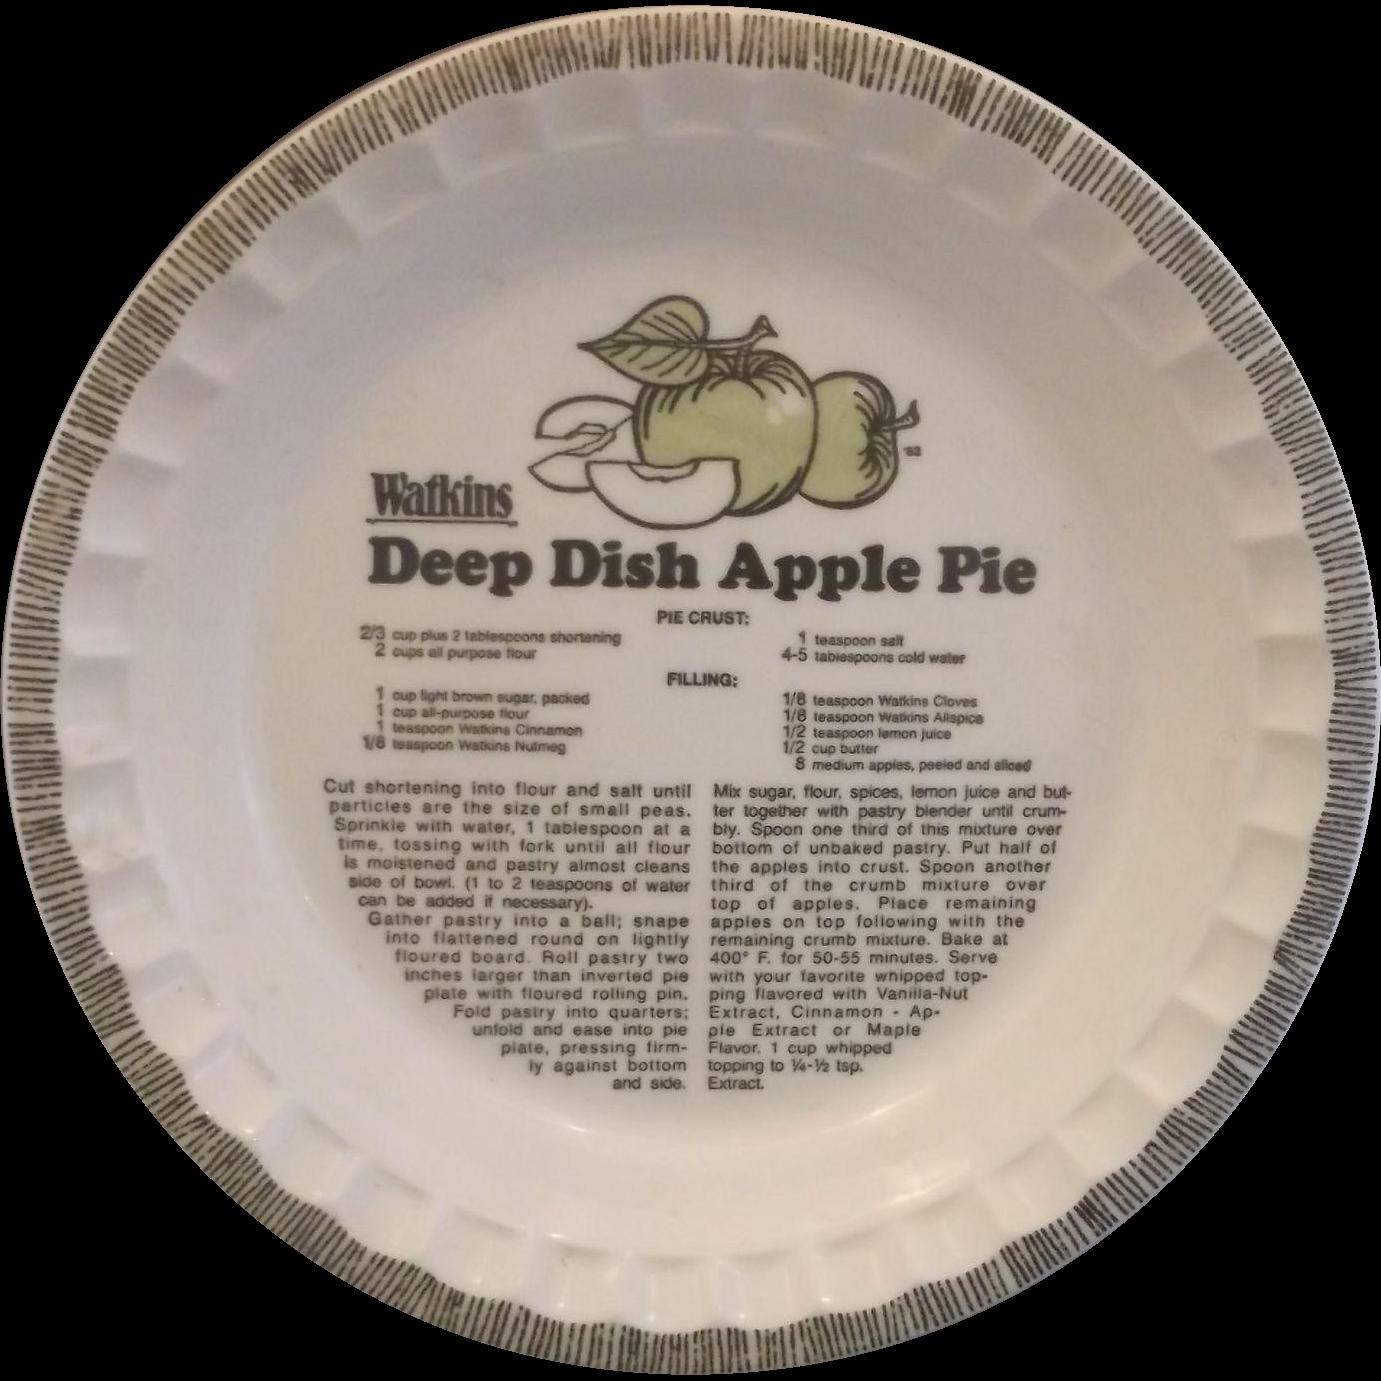 Watkins Deep Dish Apple Pie Plate Recipe Printed Royal China Green Apples  sc 1 st  Pinterest & Watkins Deep Dish Apple Pie Plate Recipe Printed Royal China Green ...